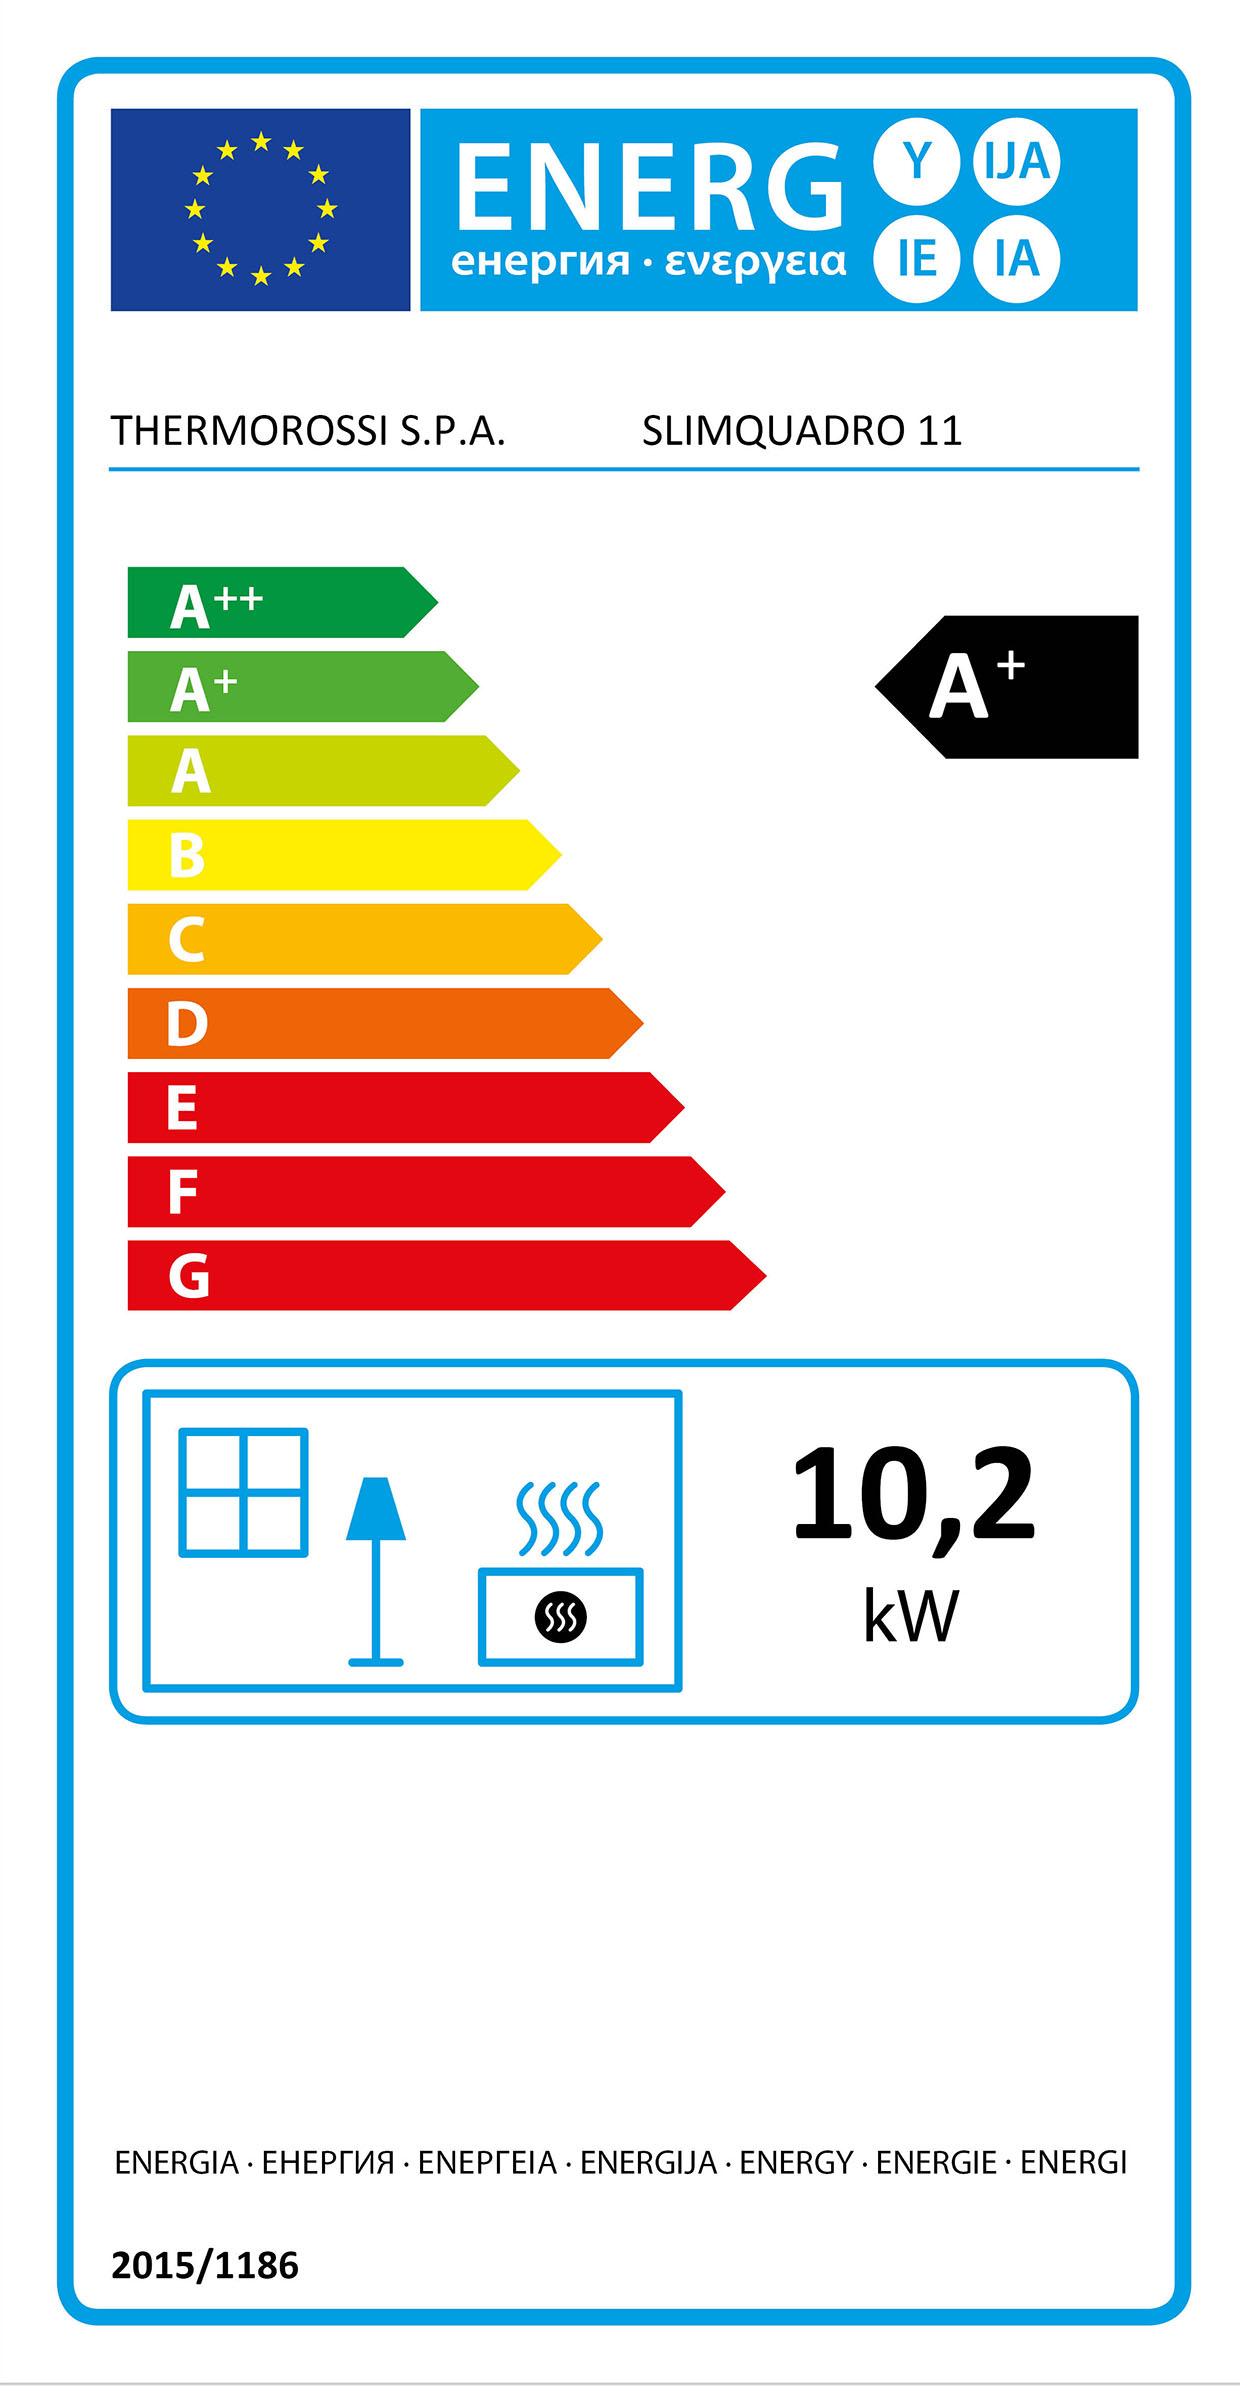 slimquadro-11 - energielabel